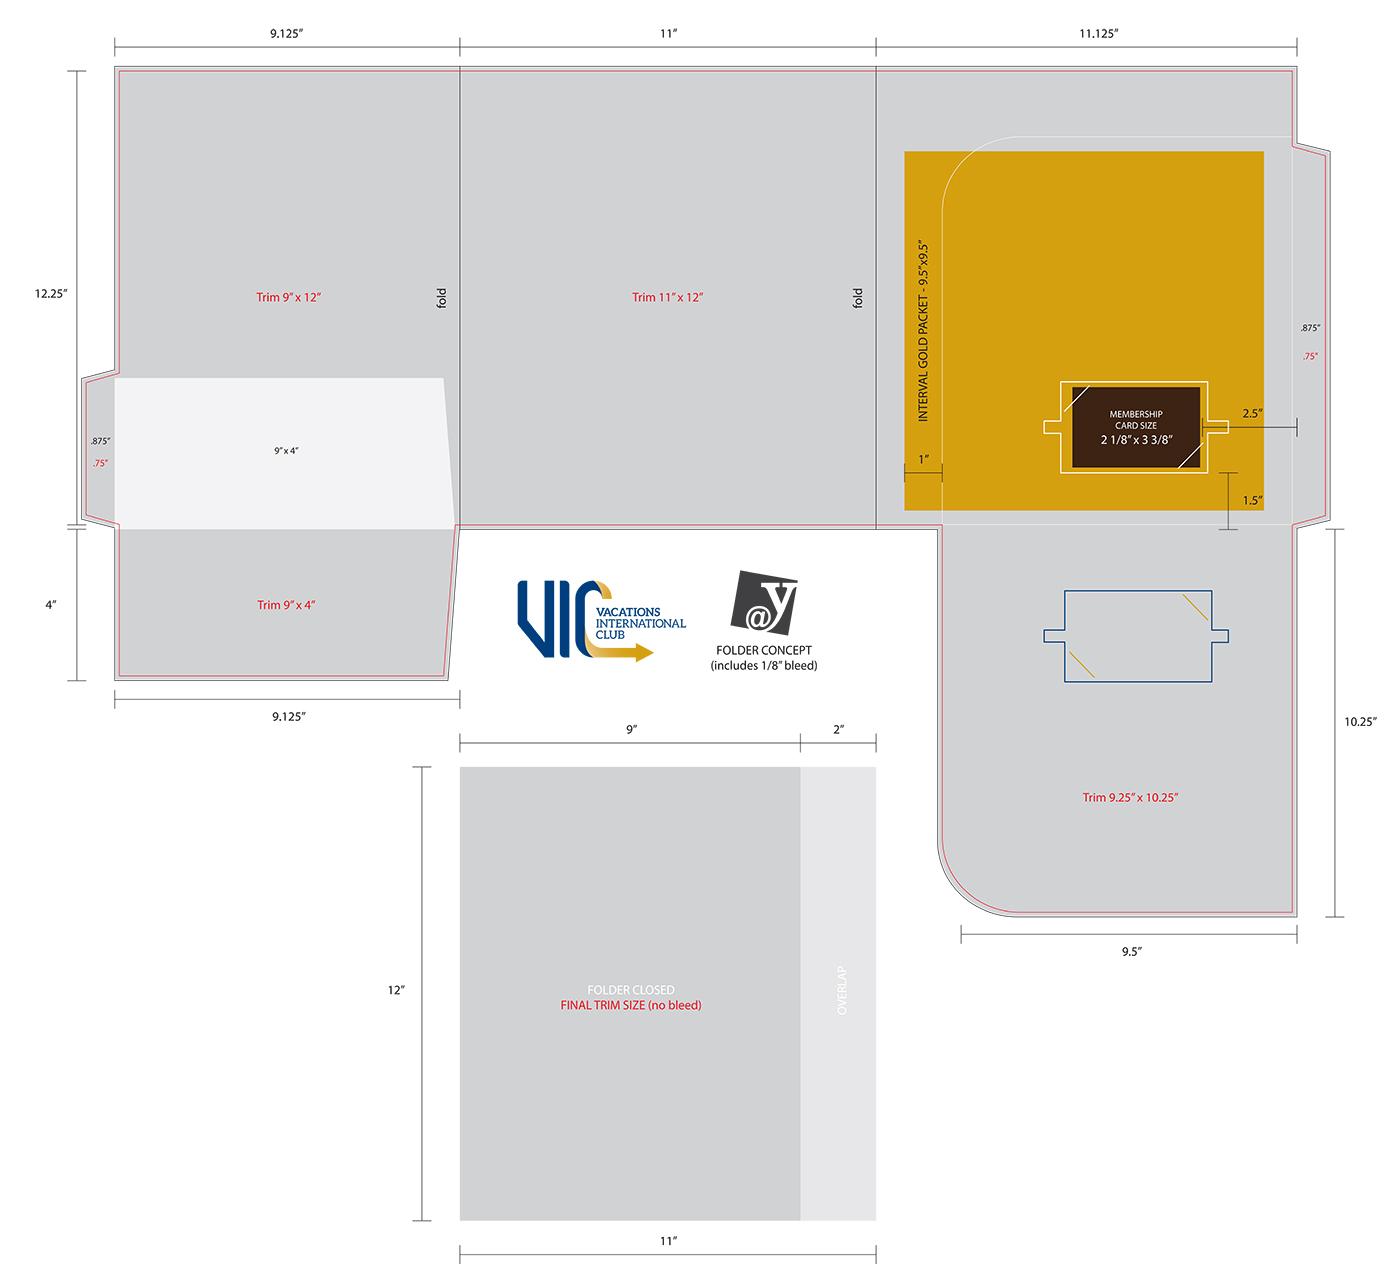 Vacations International Club folder layout